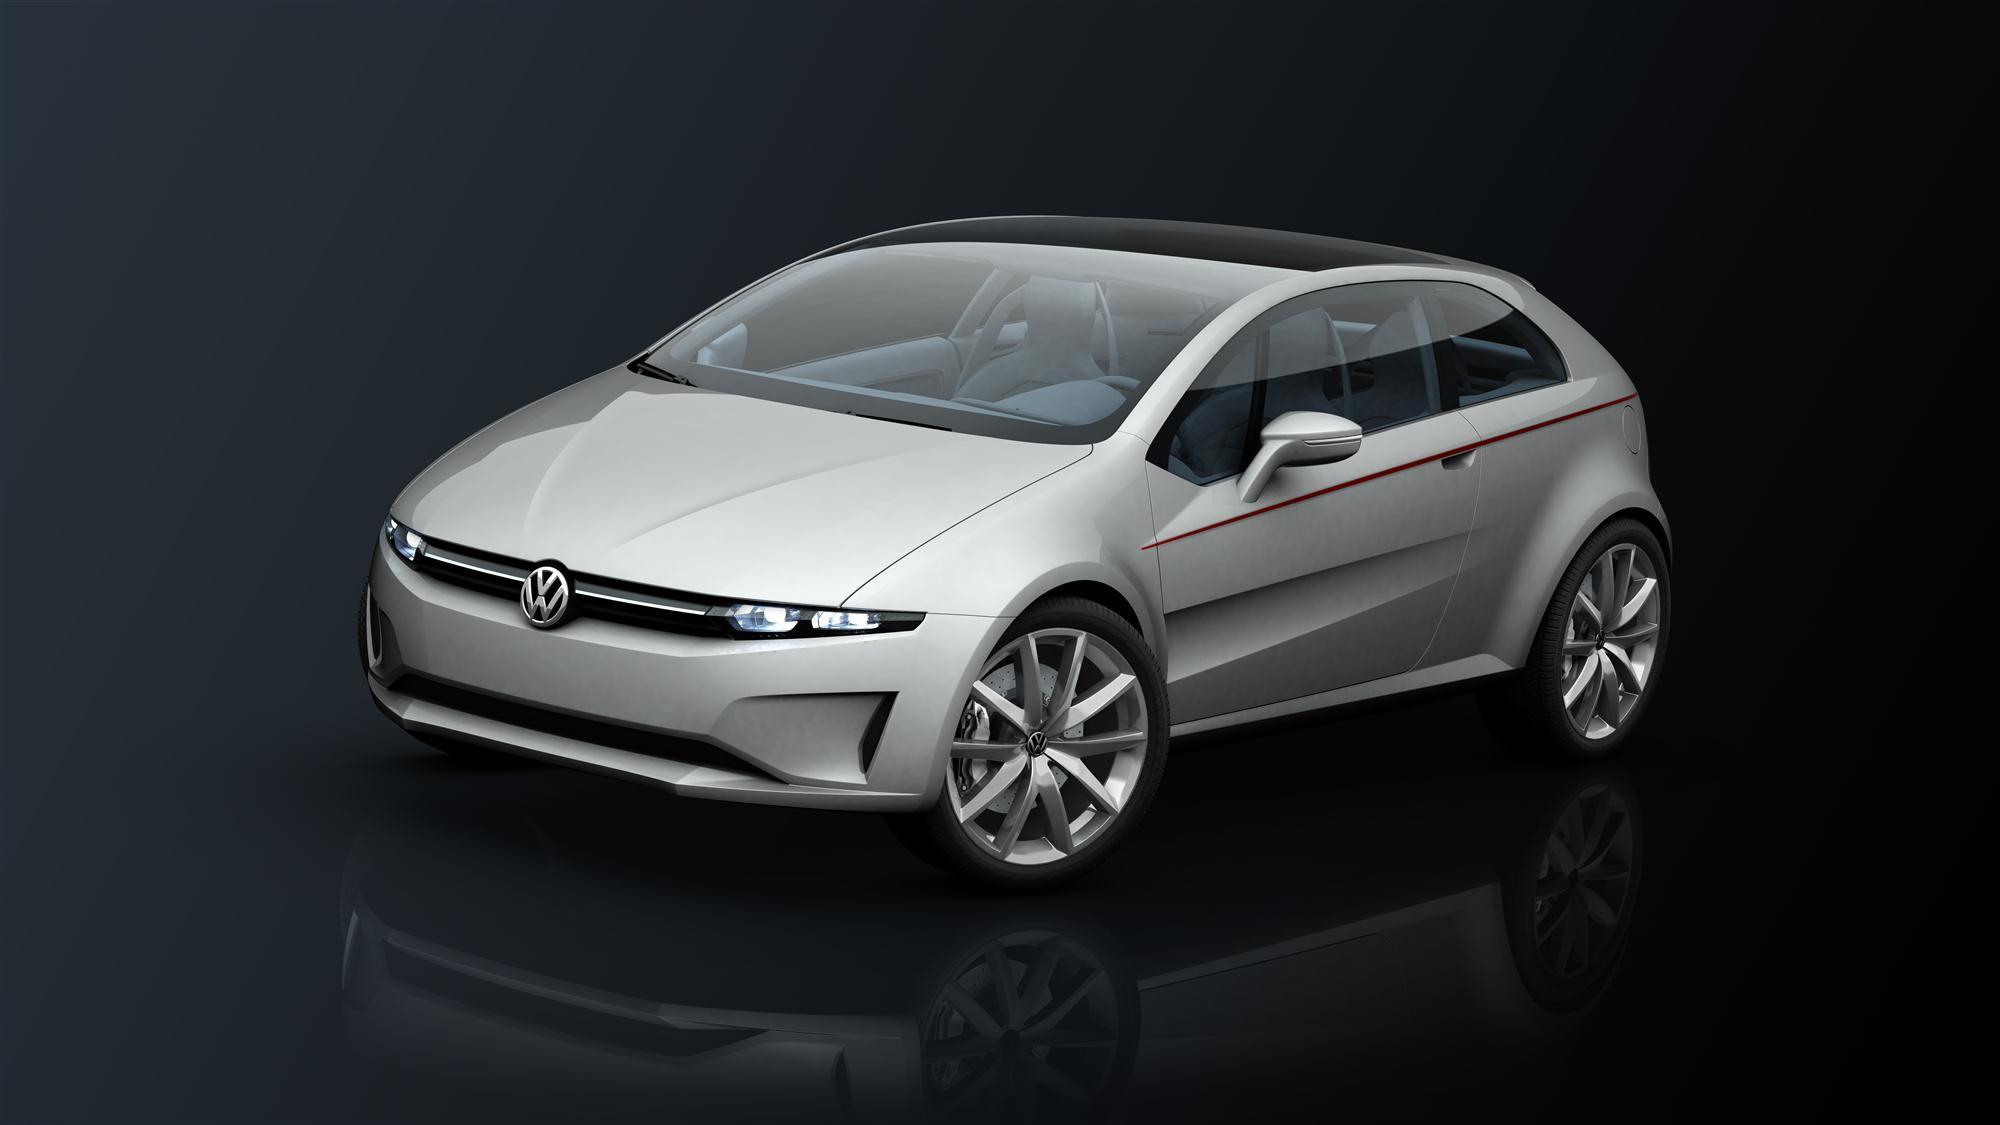 VW Italdesign Giugiaro Tex Concept